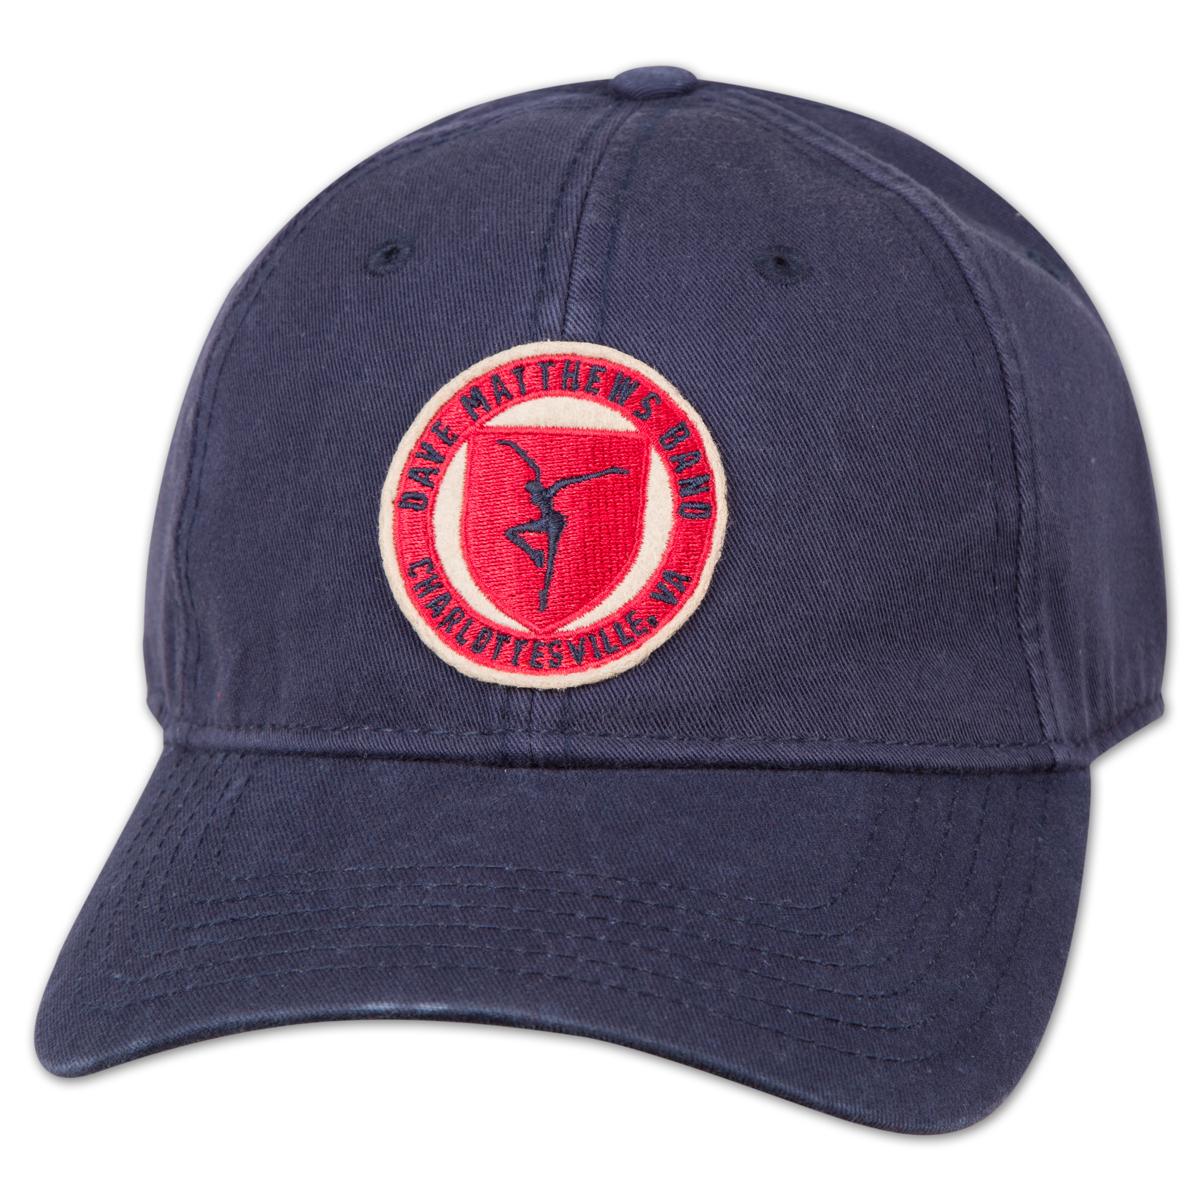 DMB - Charlottesville, VA Hat